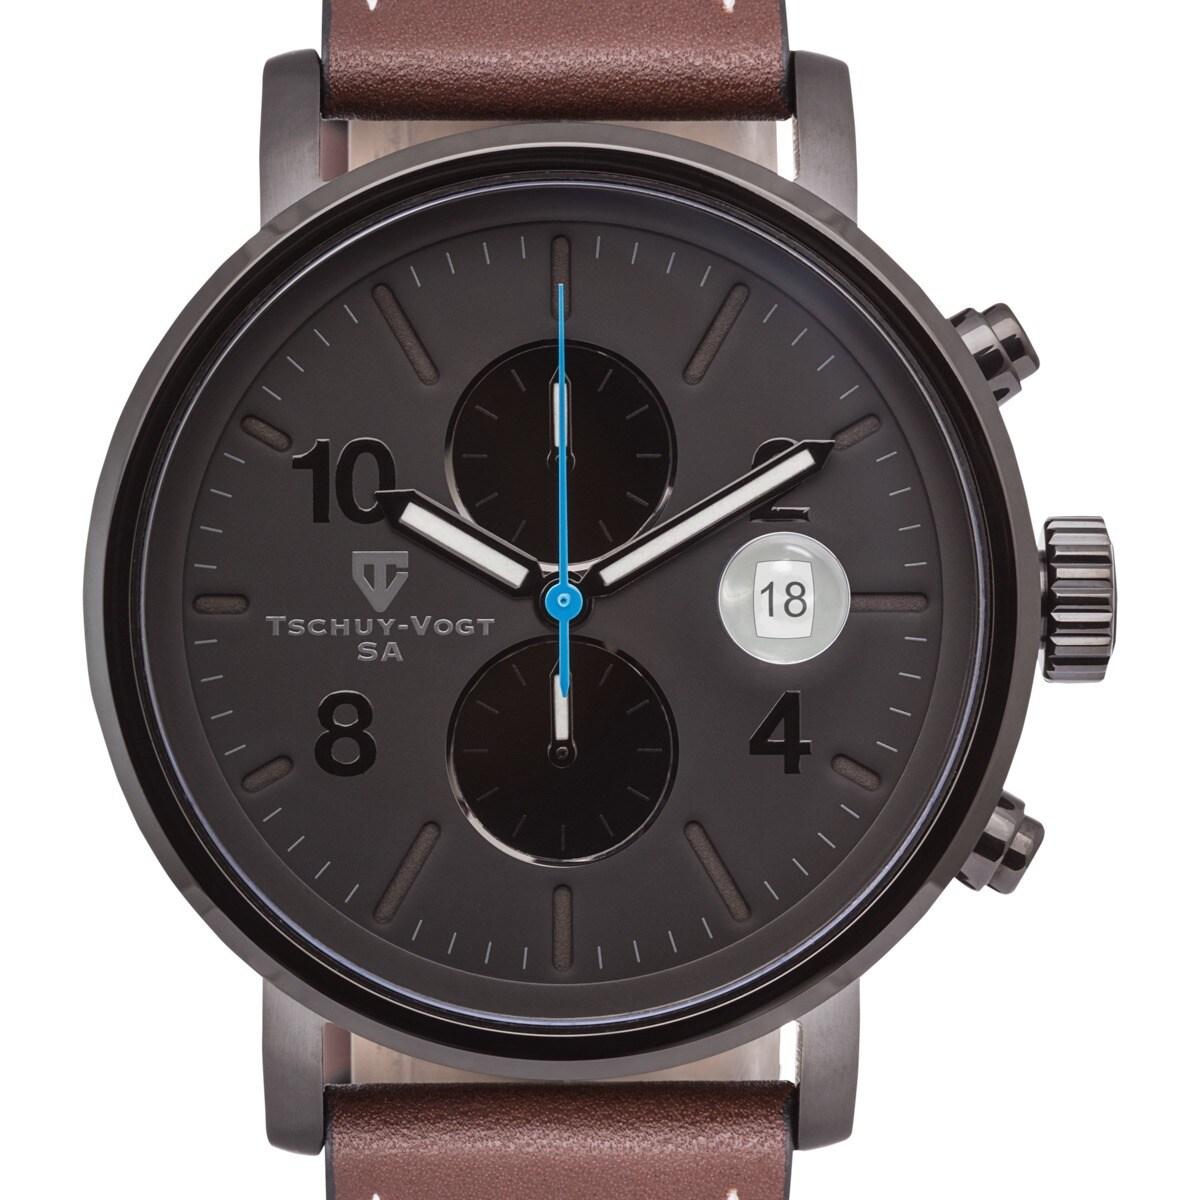 Tschuy-Vogt M60 Patton Men's Chronograph Watch Super Lumi...